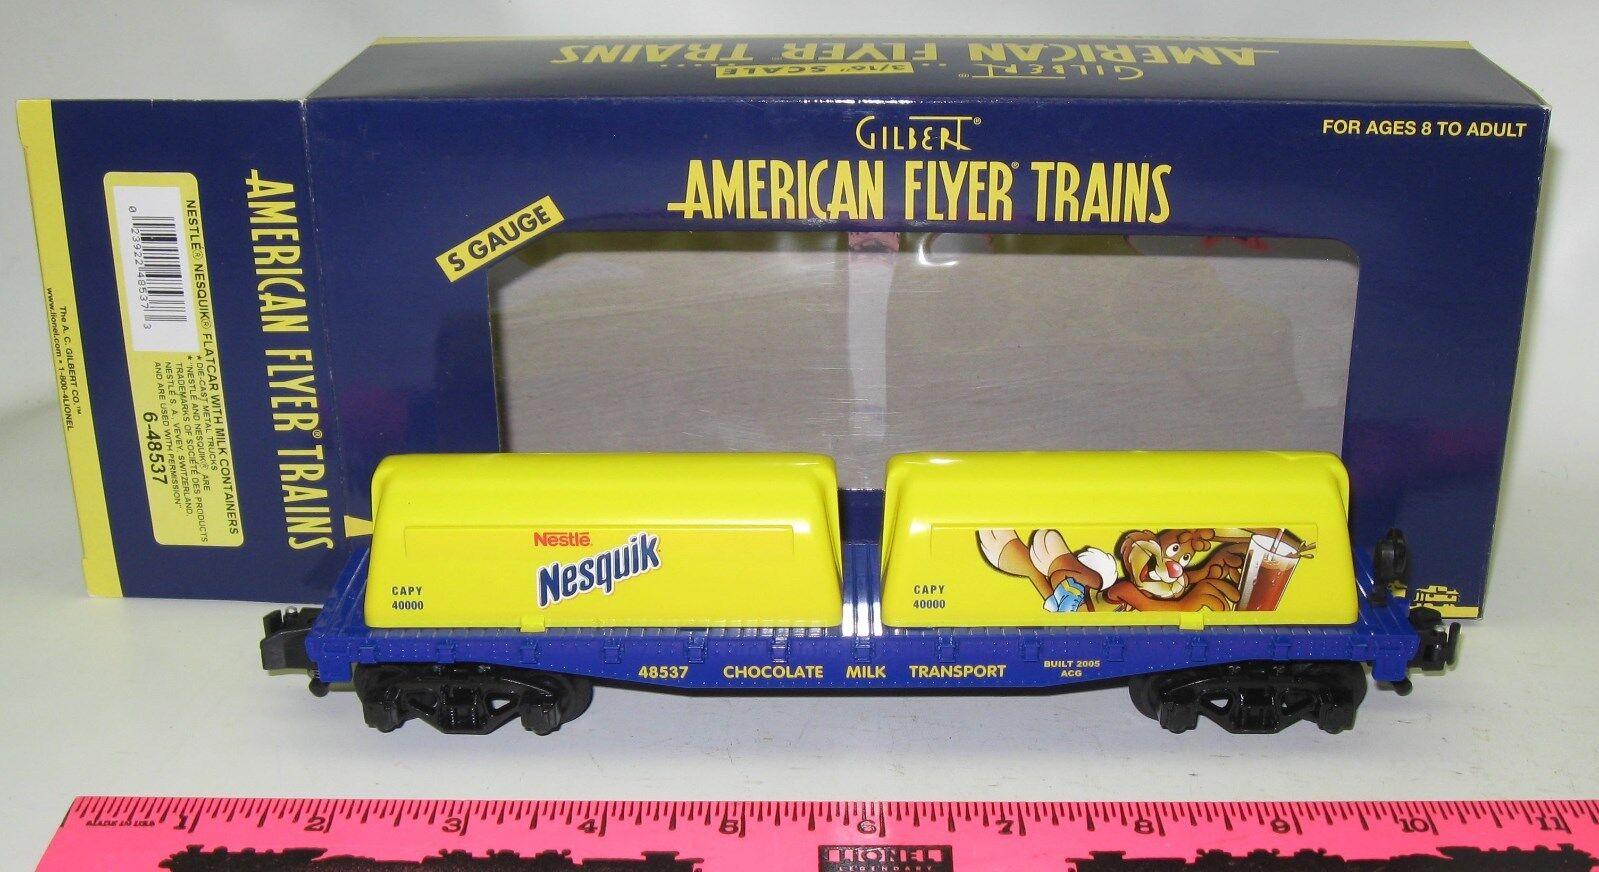 American Flyer NIB 6-48537 Nestle Nesquik, flatcar with